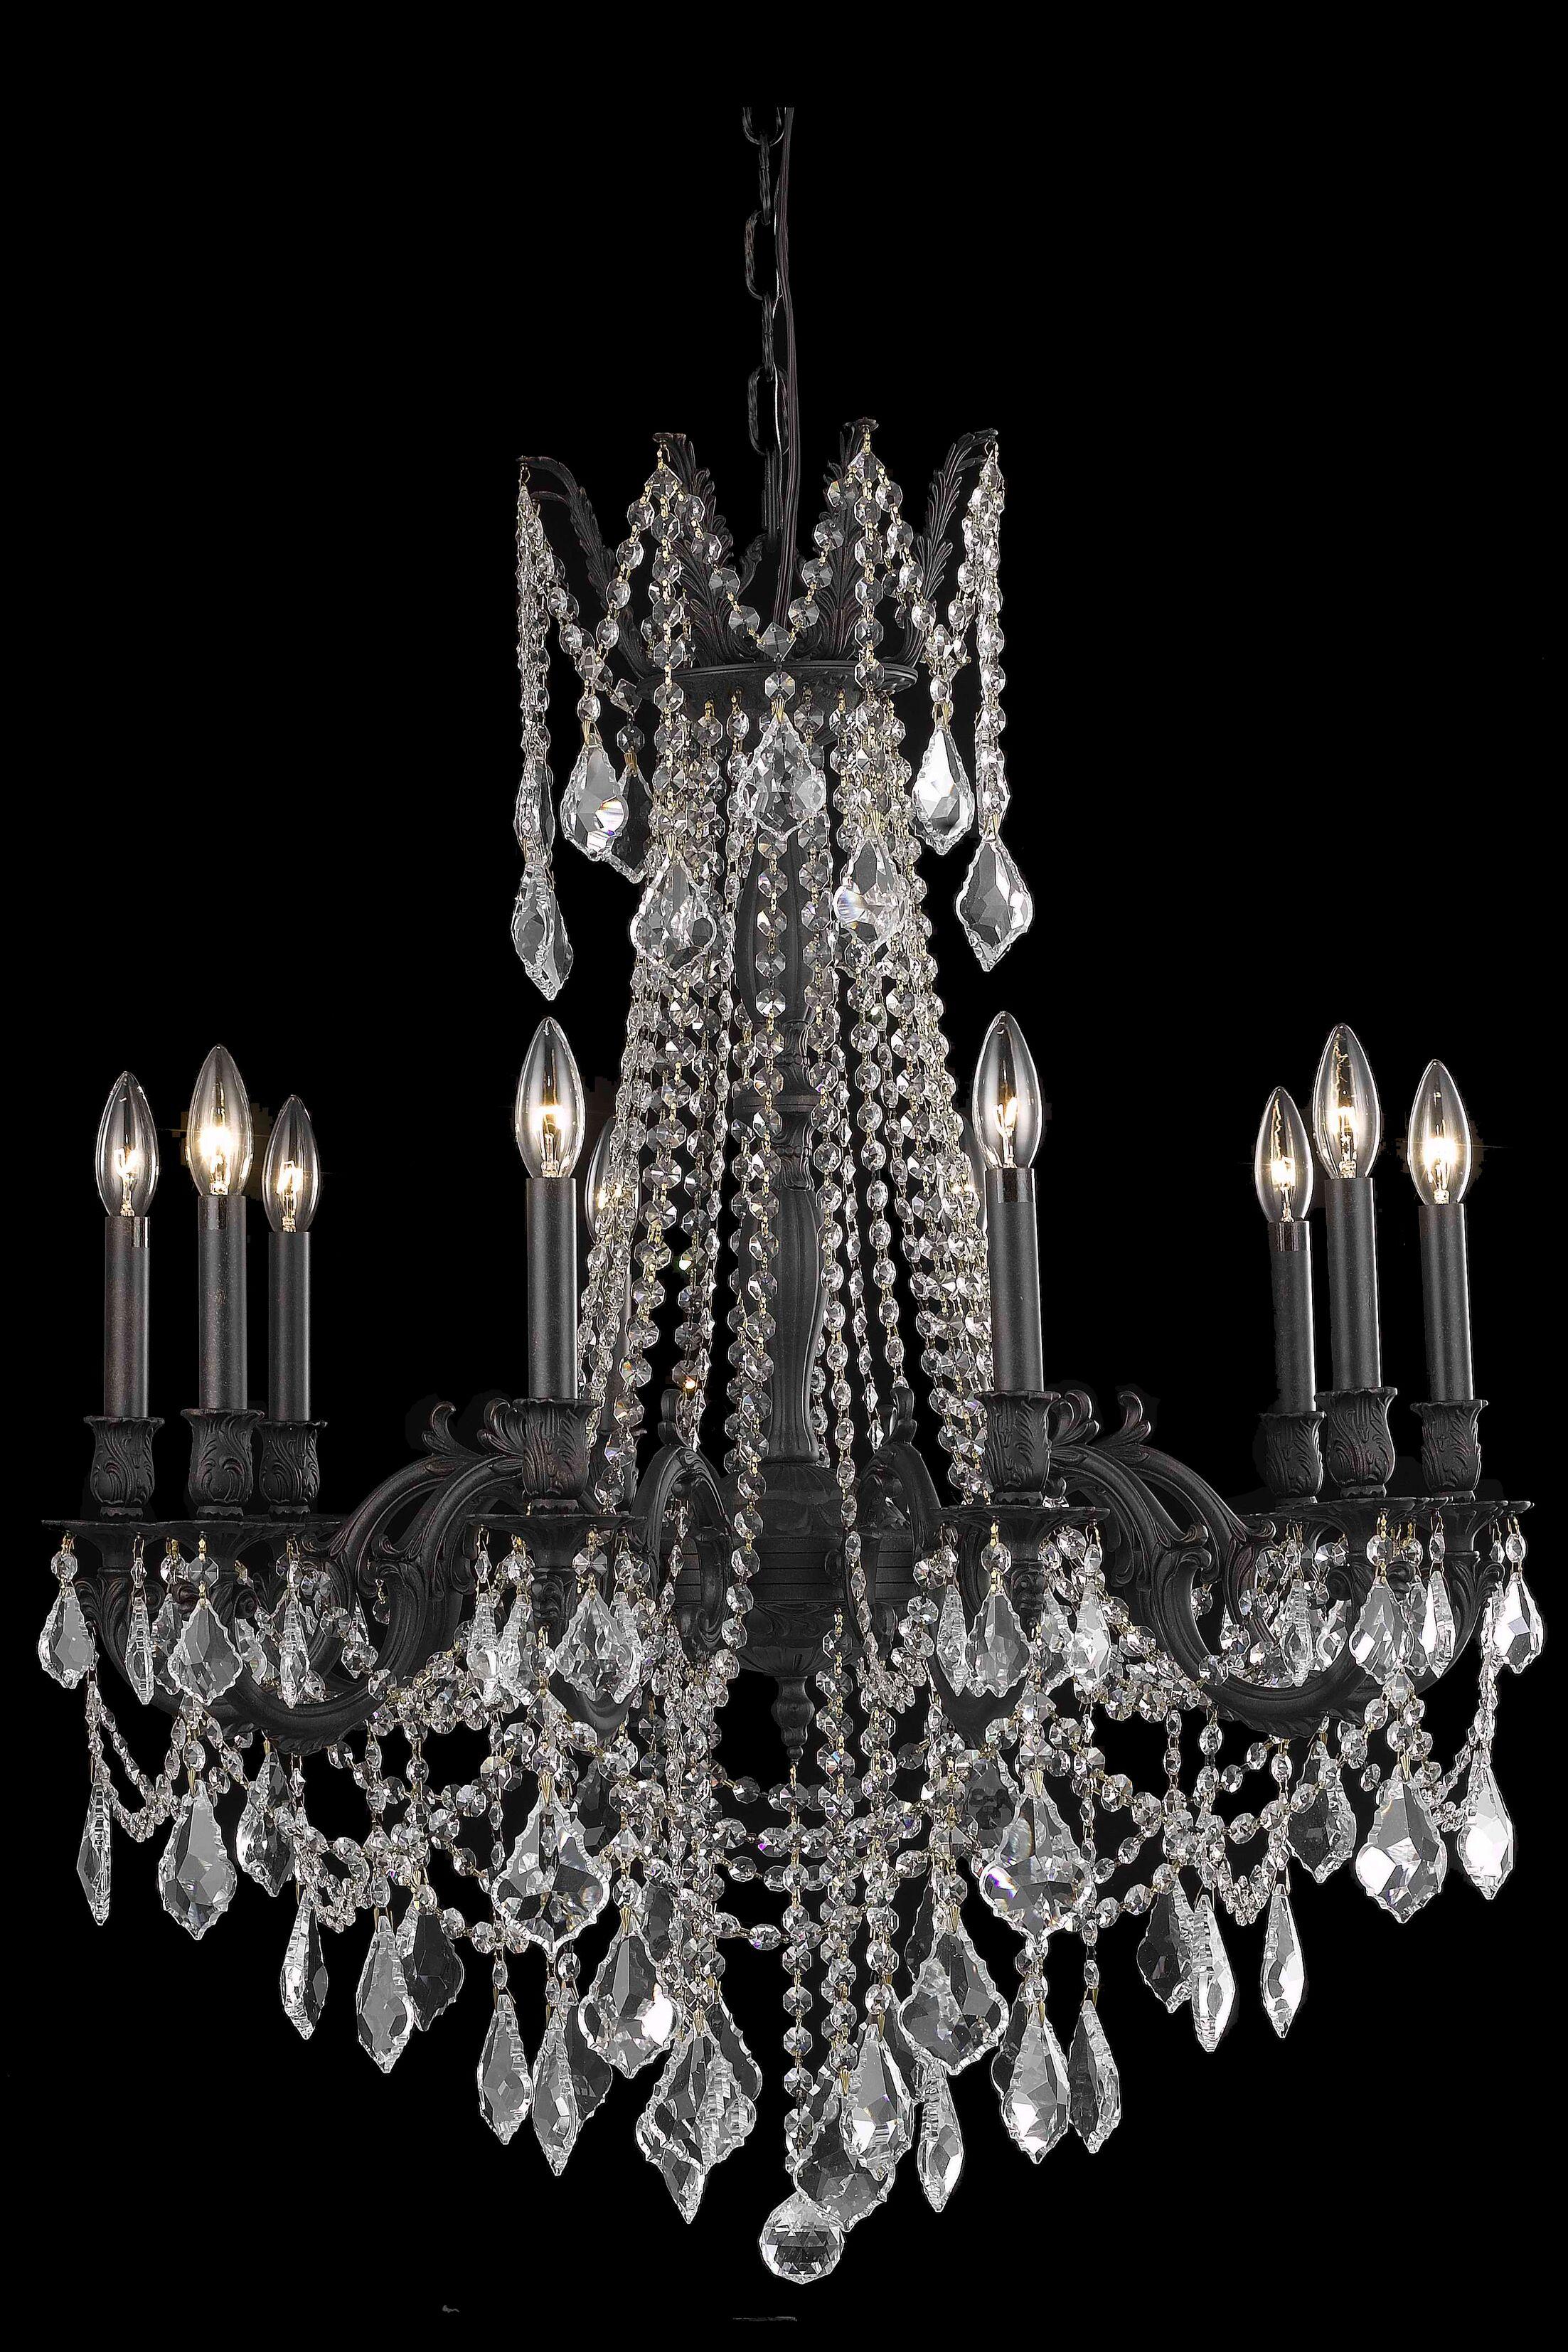 Utica 10-Light Candle Style Chandelier Crystal Color / Crystal Trim: Golden Teak (Smoky) / Royal Cut